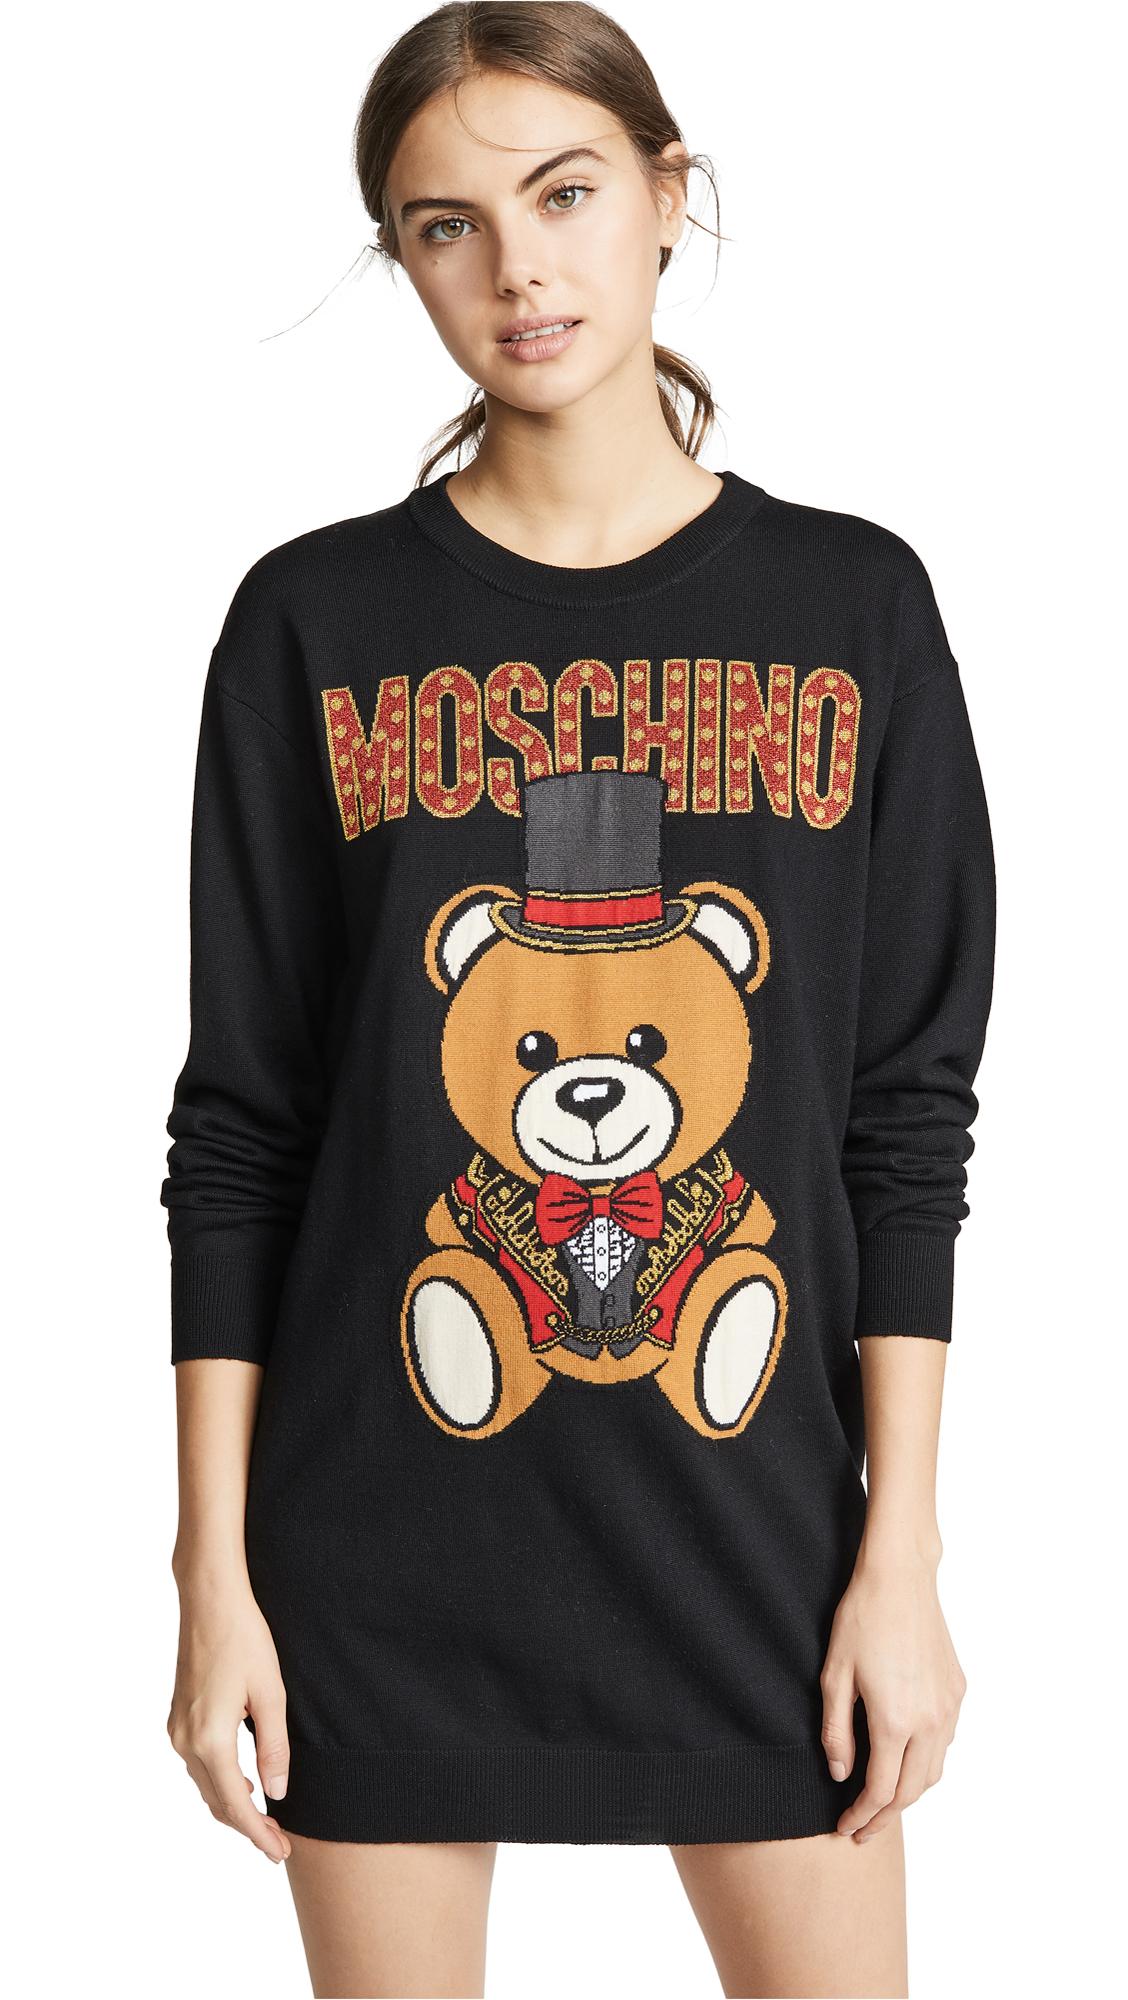 Moschino Top Hat Bear Sweatshirt Dress - Black Multi